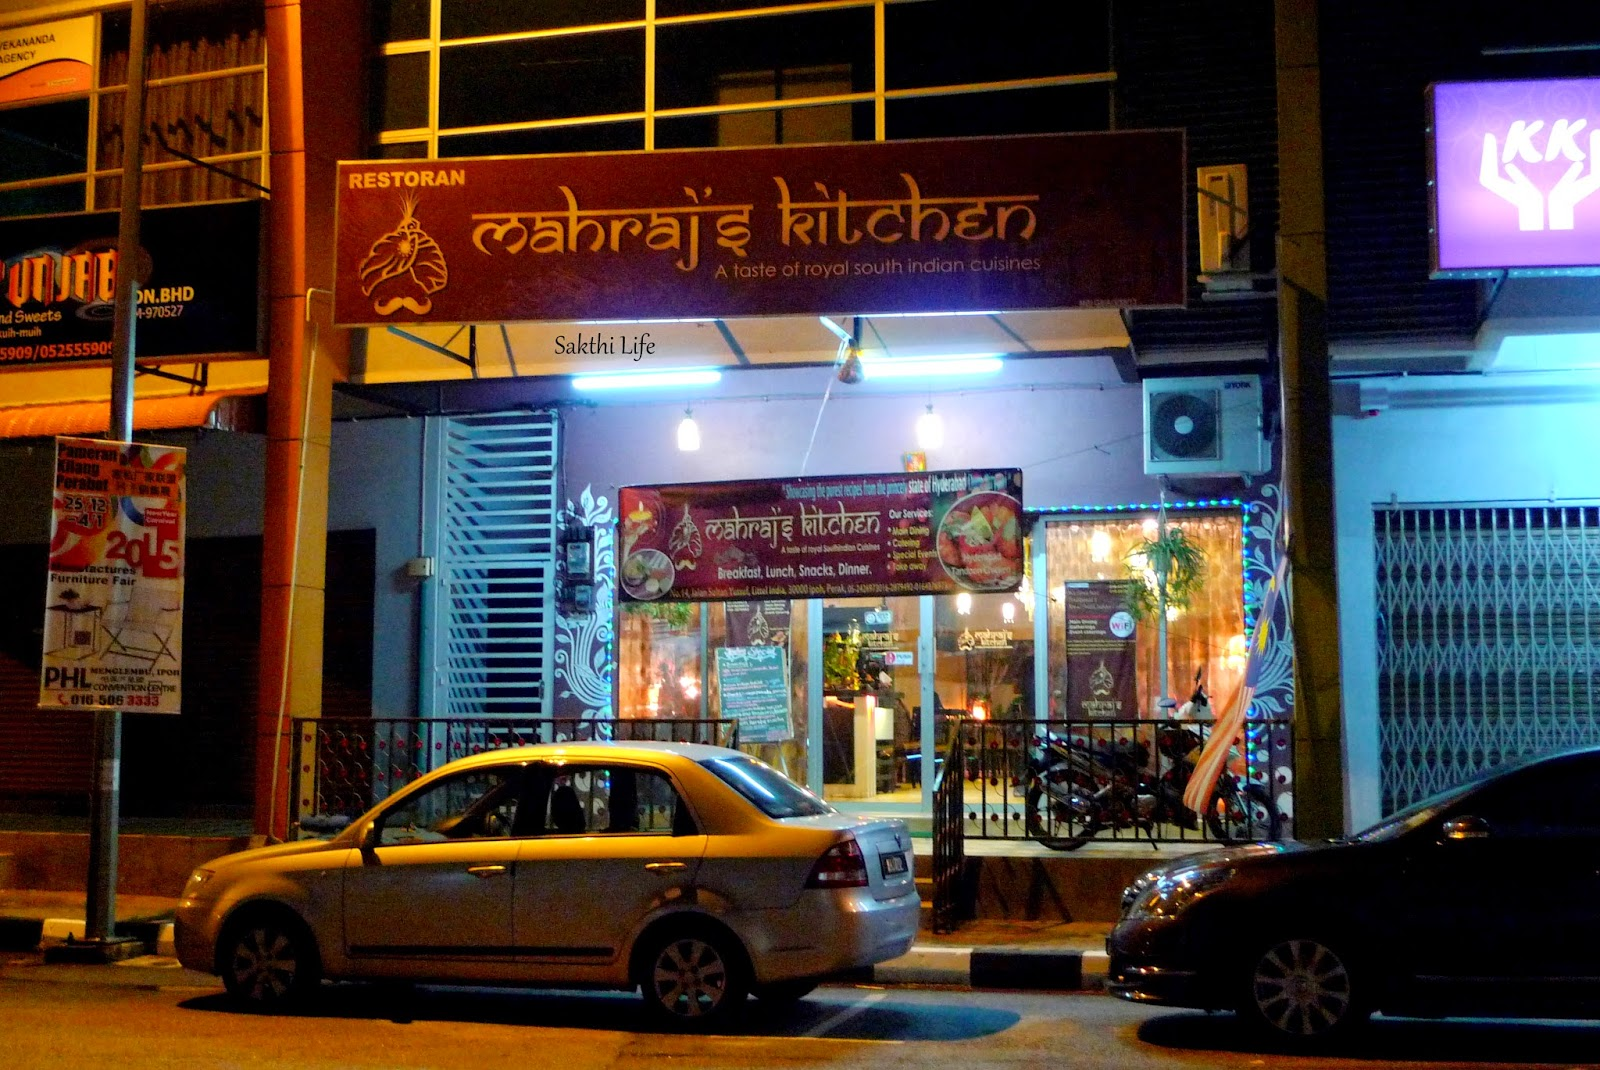 Butcher Kitchen Ipoh : Mahraj's Kitchen @ Little India, Ipoh